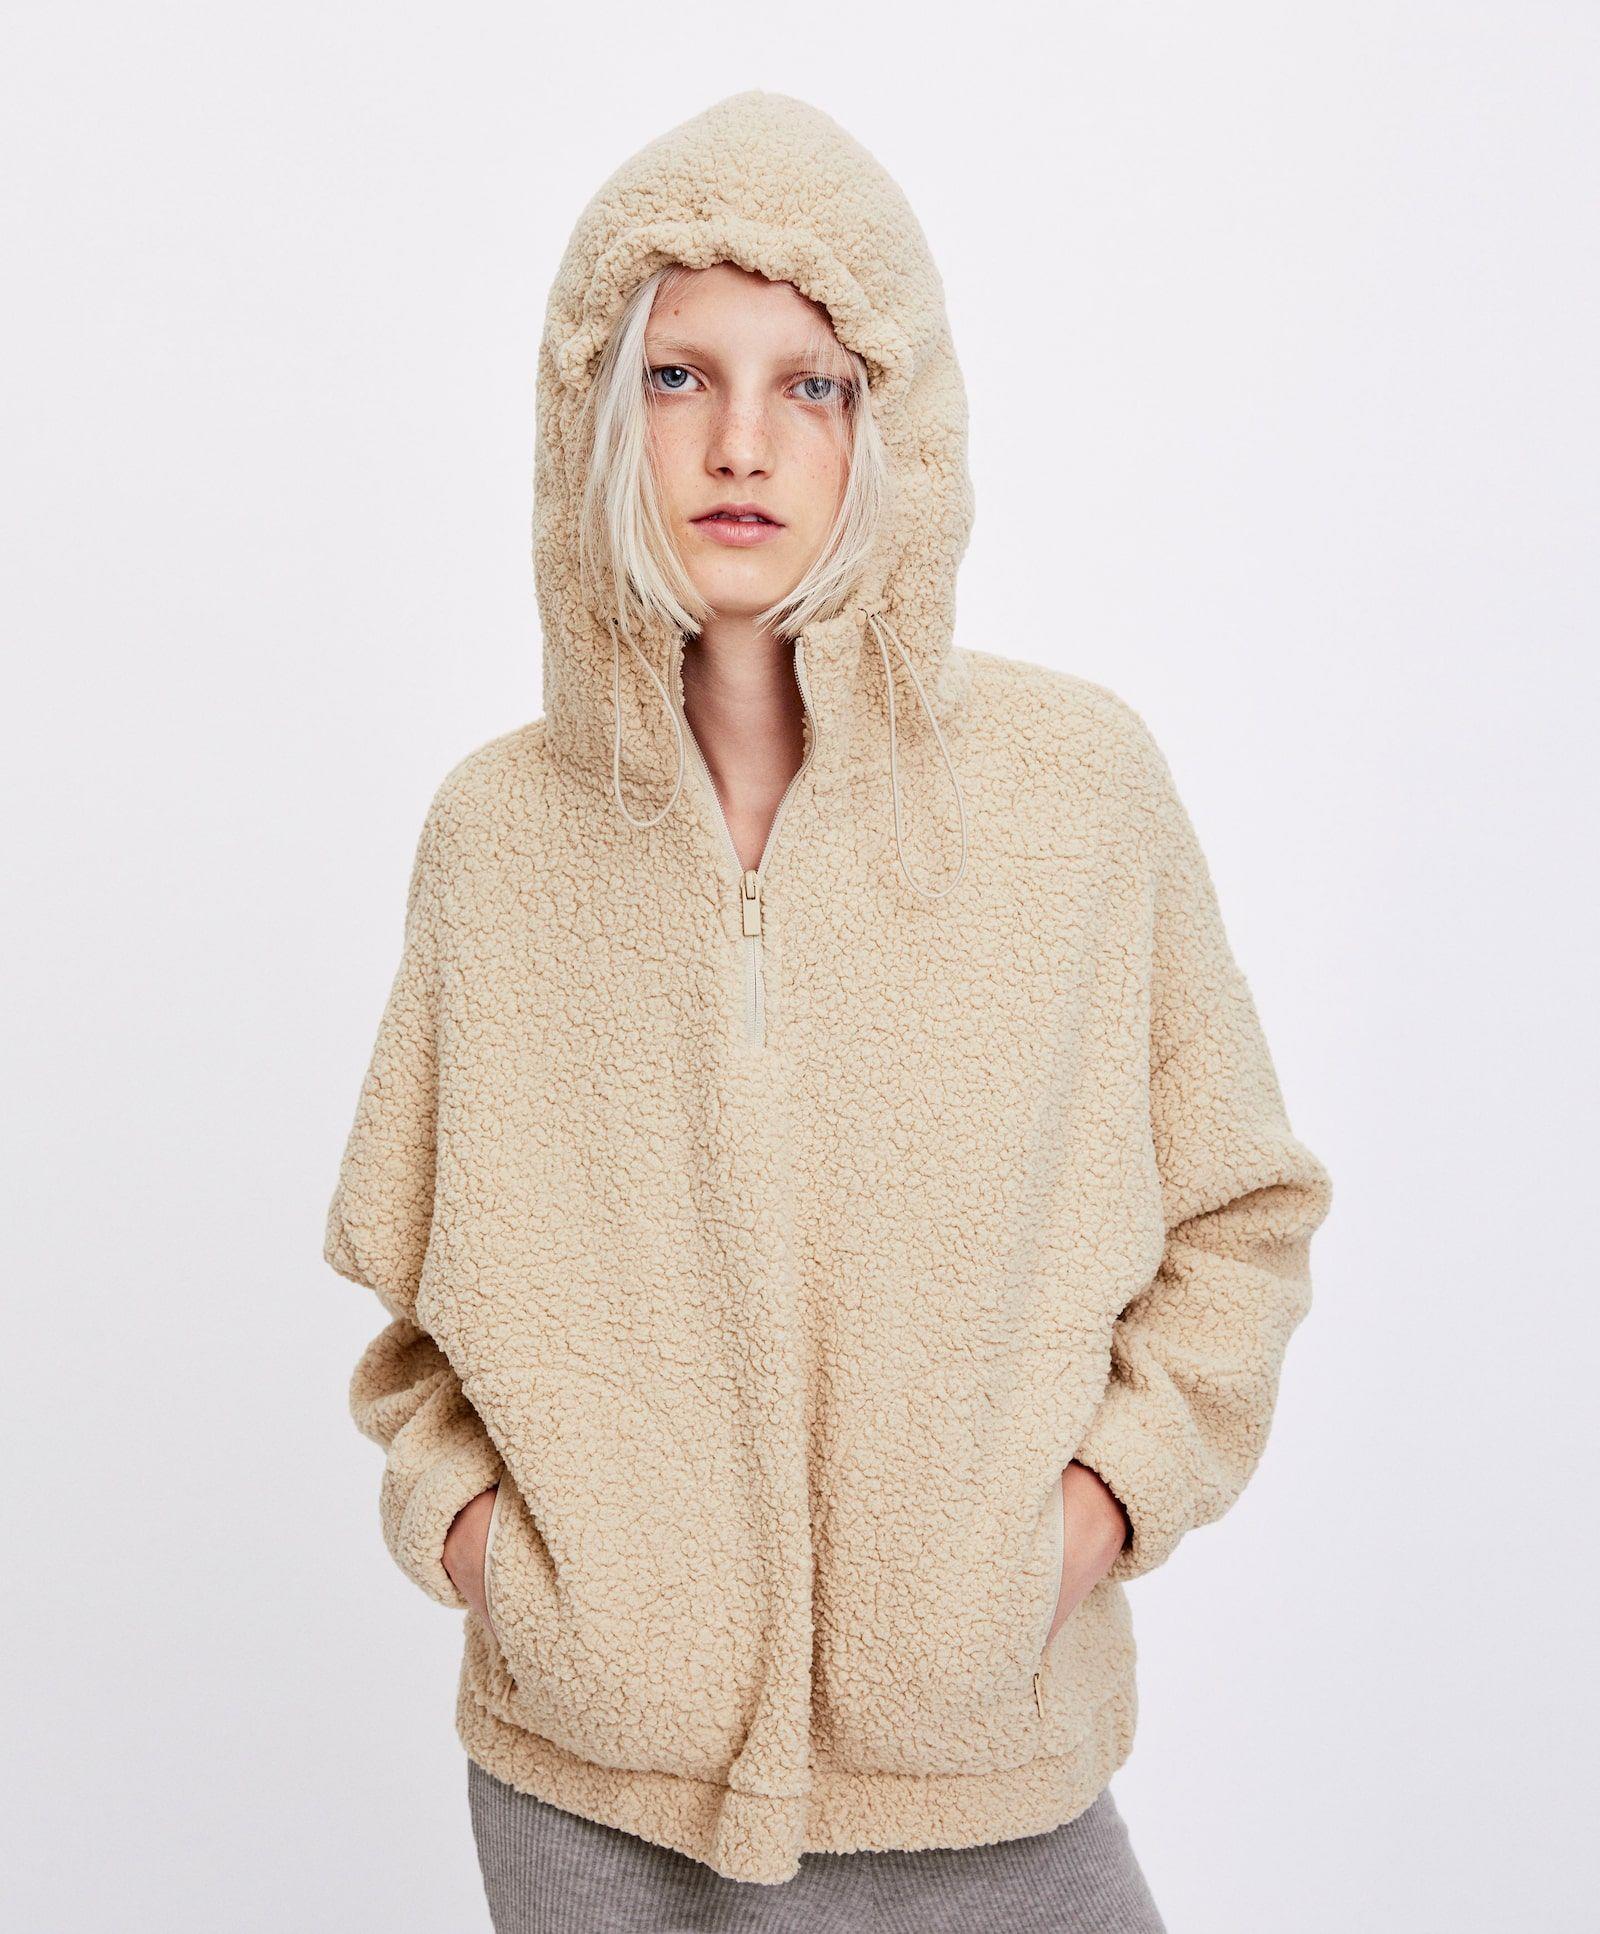 Beige Hooded Sweatshot Cotton Lounge Hoodie Streetwear Homewear Top Woman Hoodie Sportswear Longsleeve